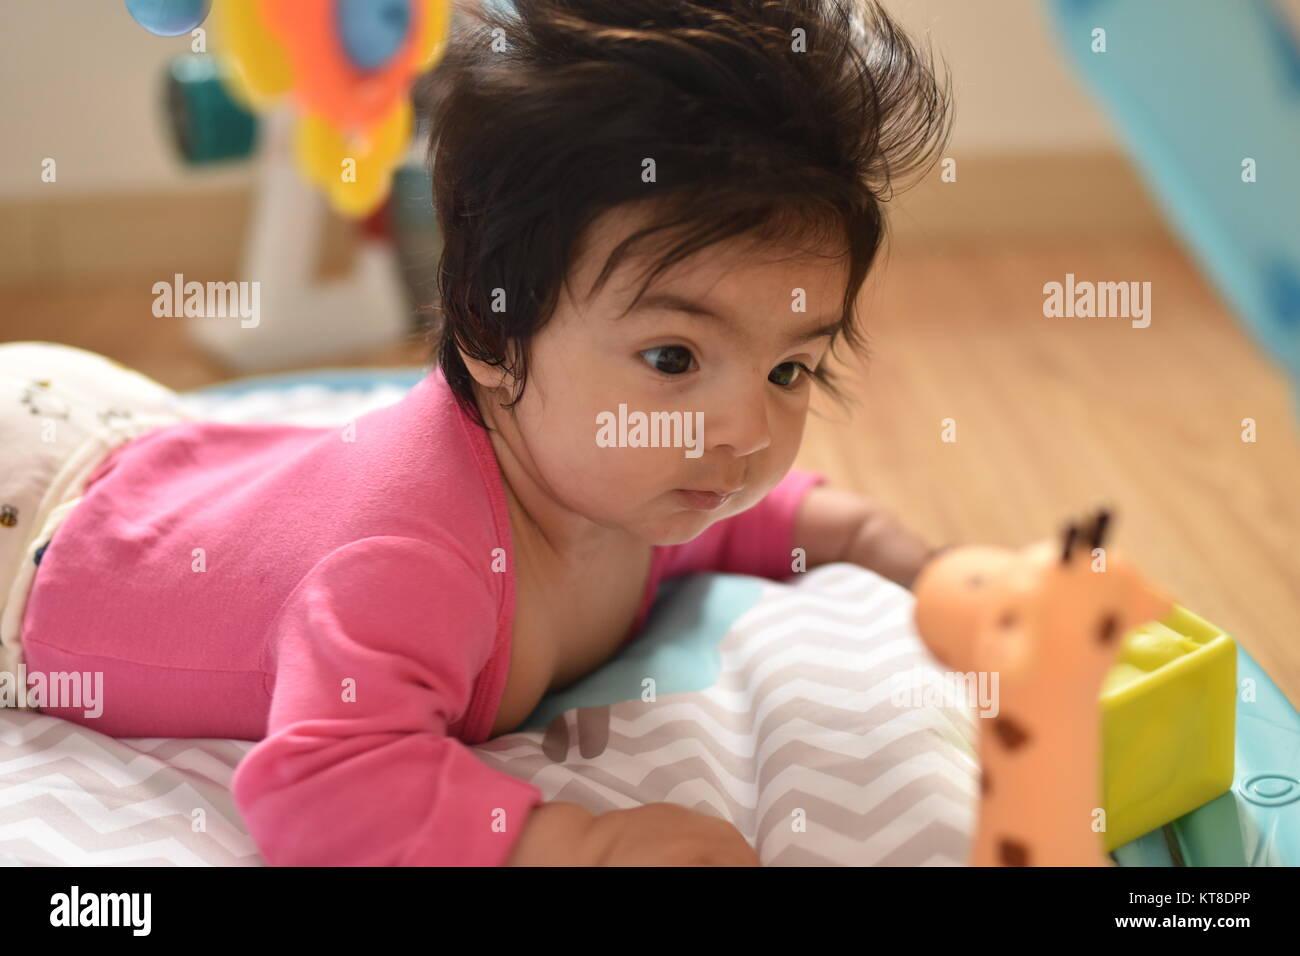 Rastreo niña mira atentamente examinando sus juguetes Imagen De Stock